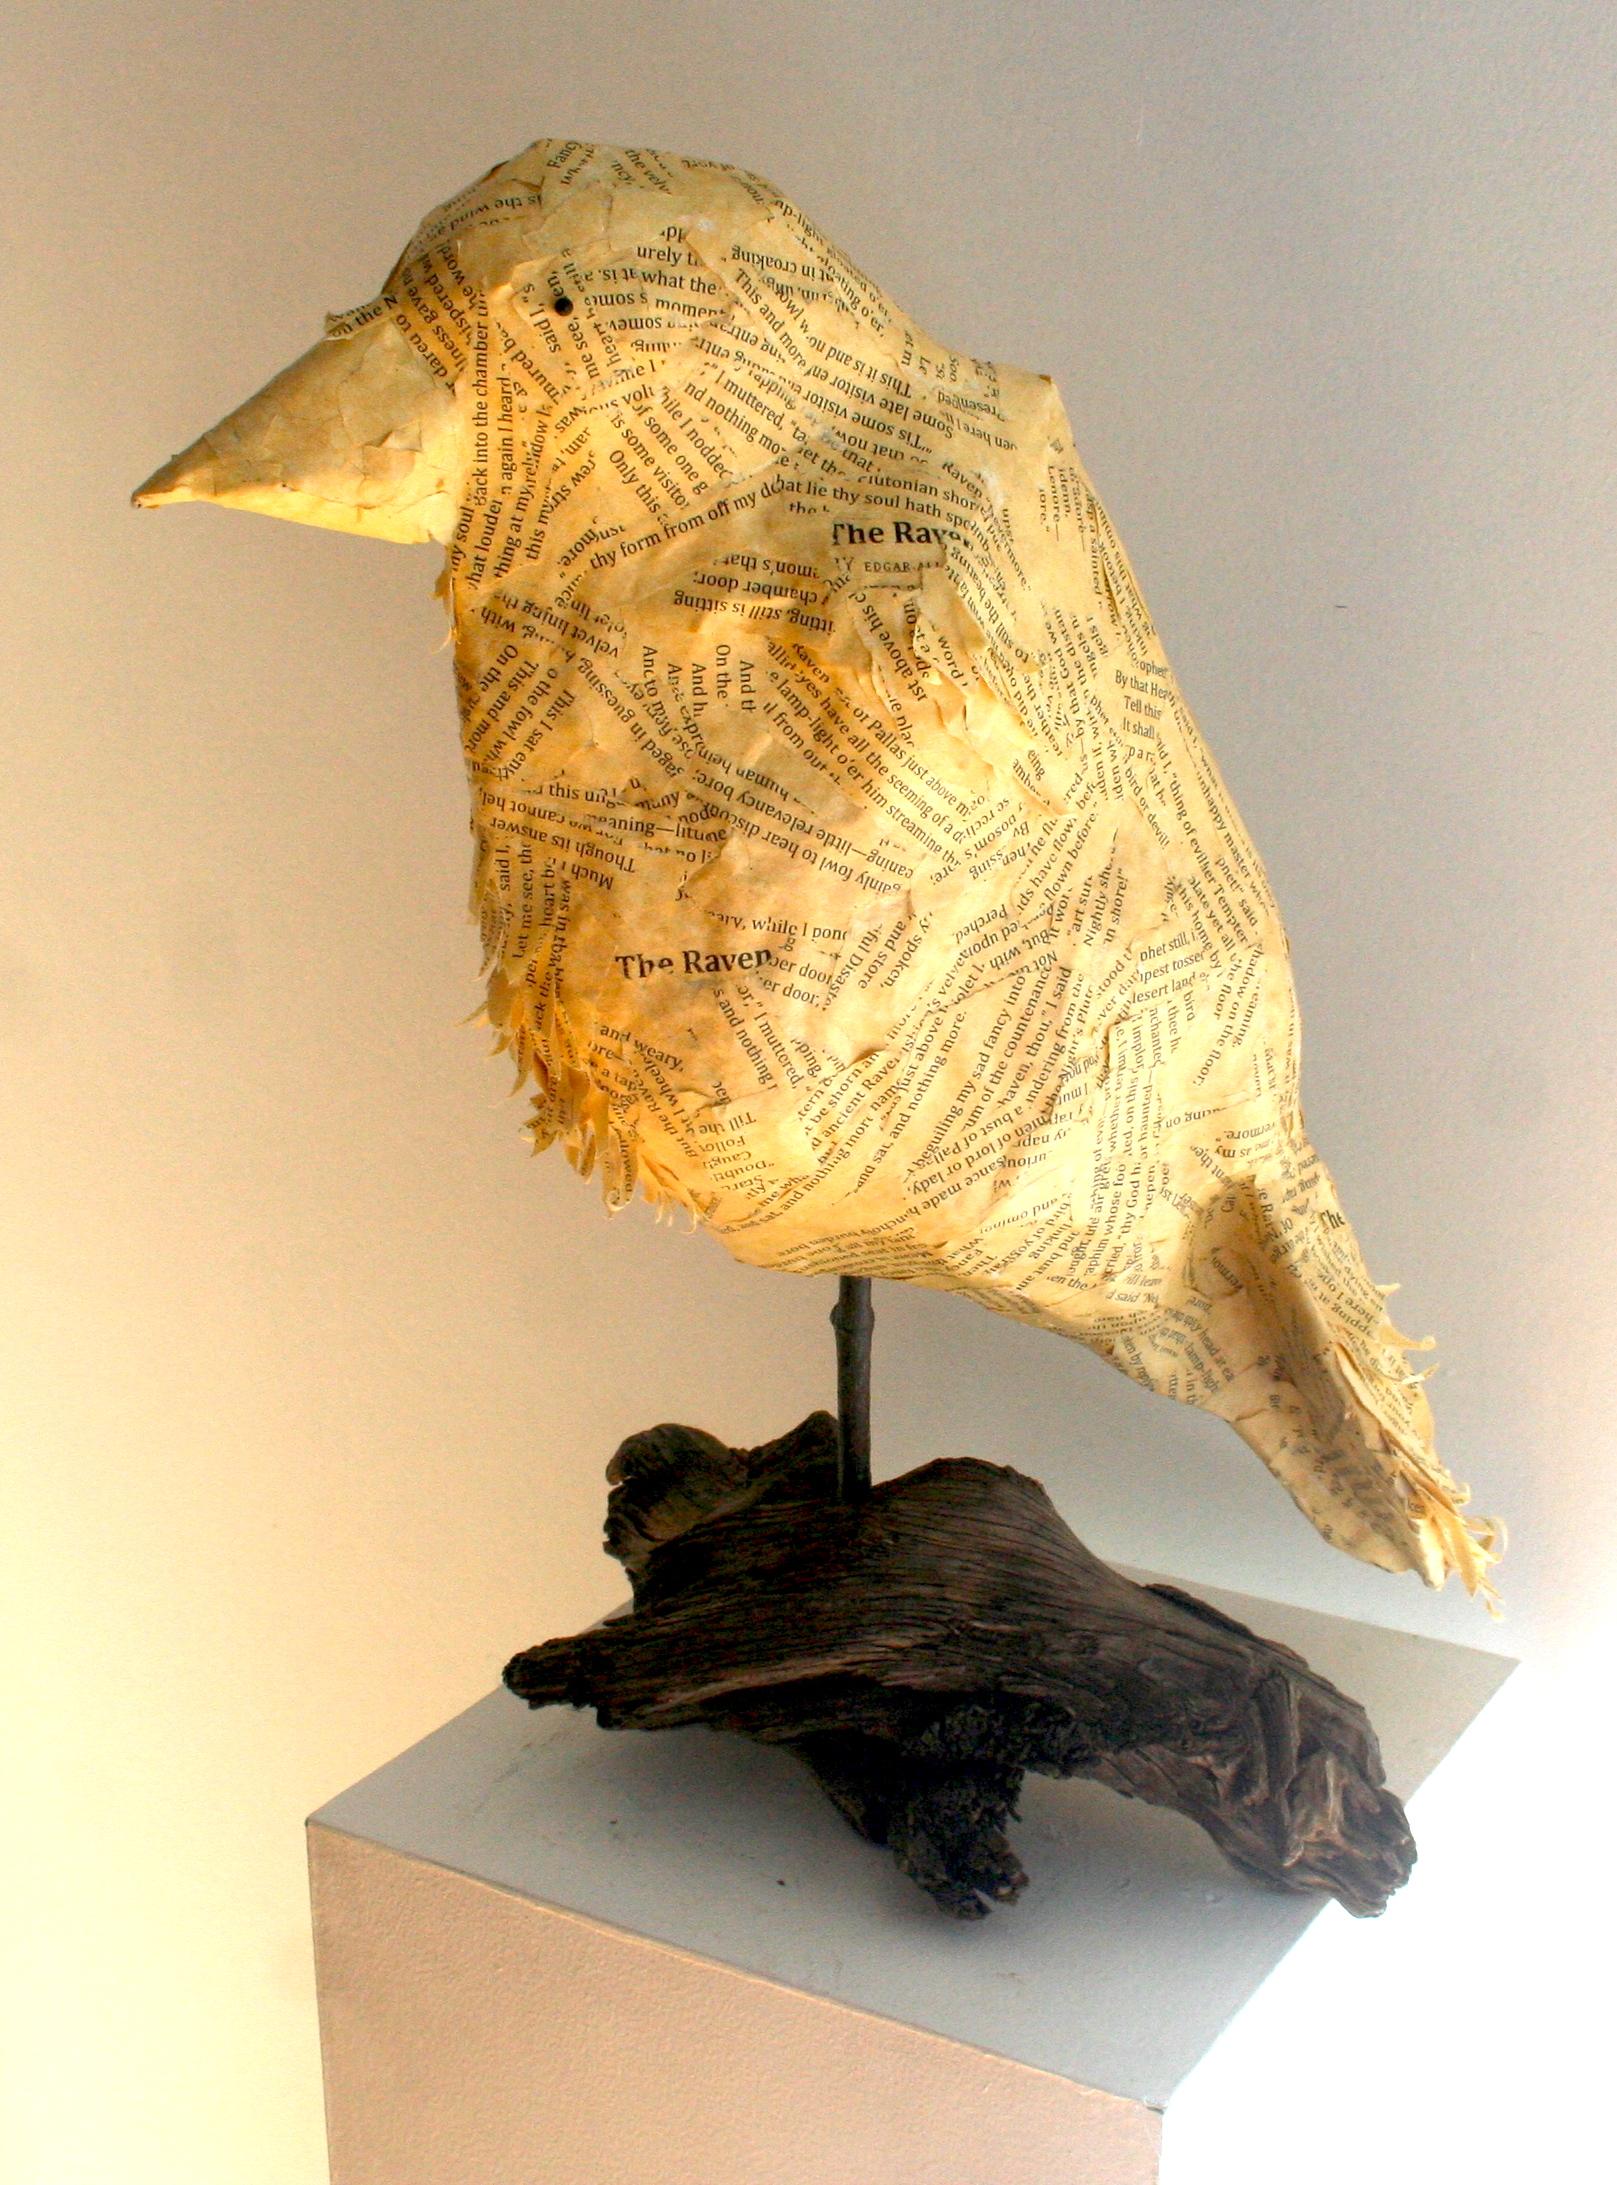 Samantha Beall